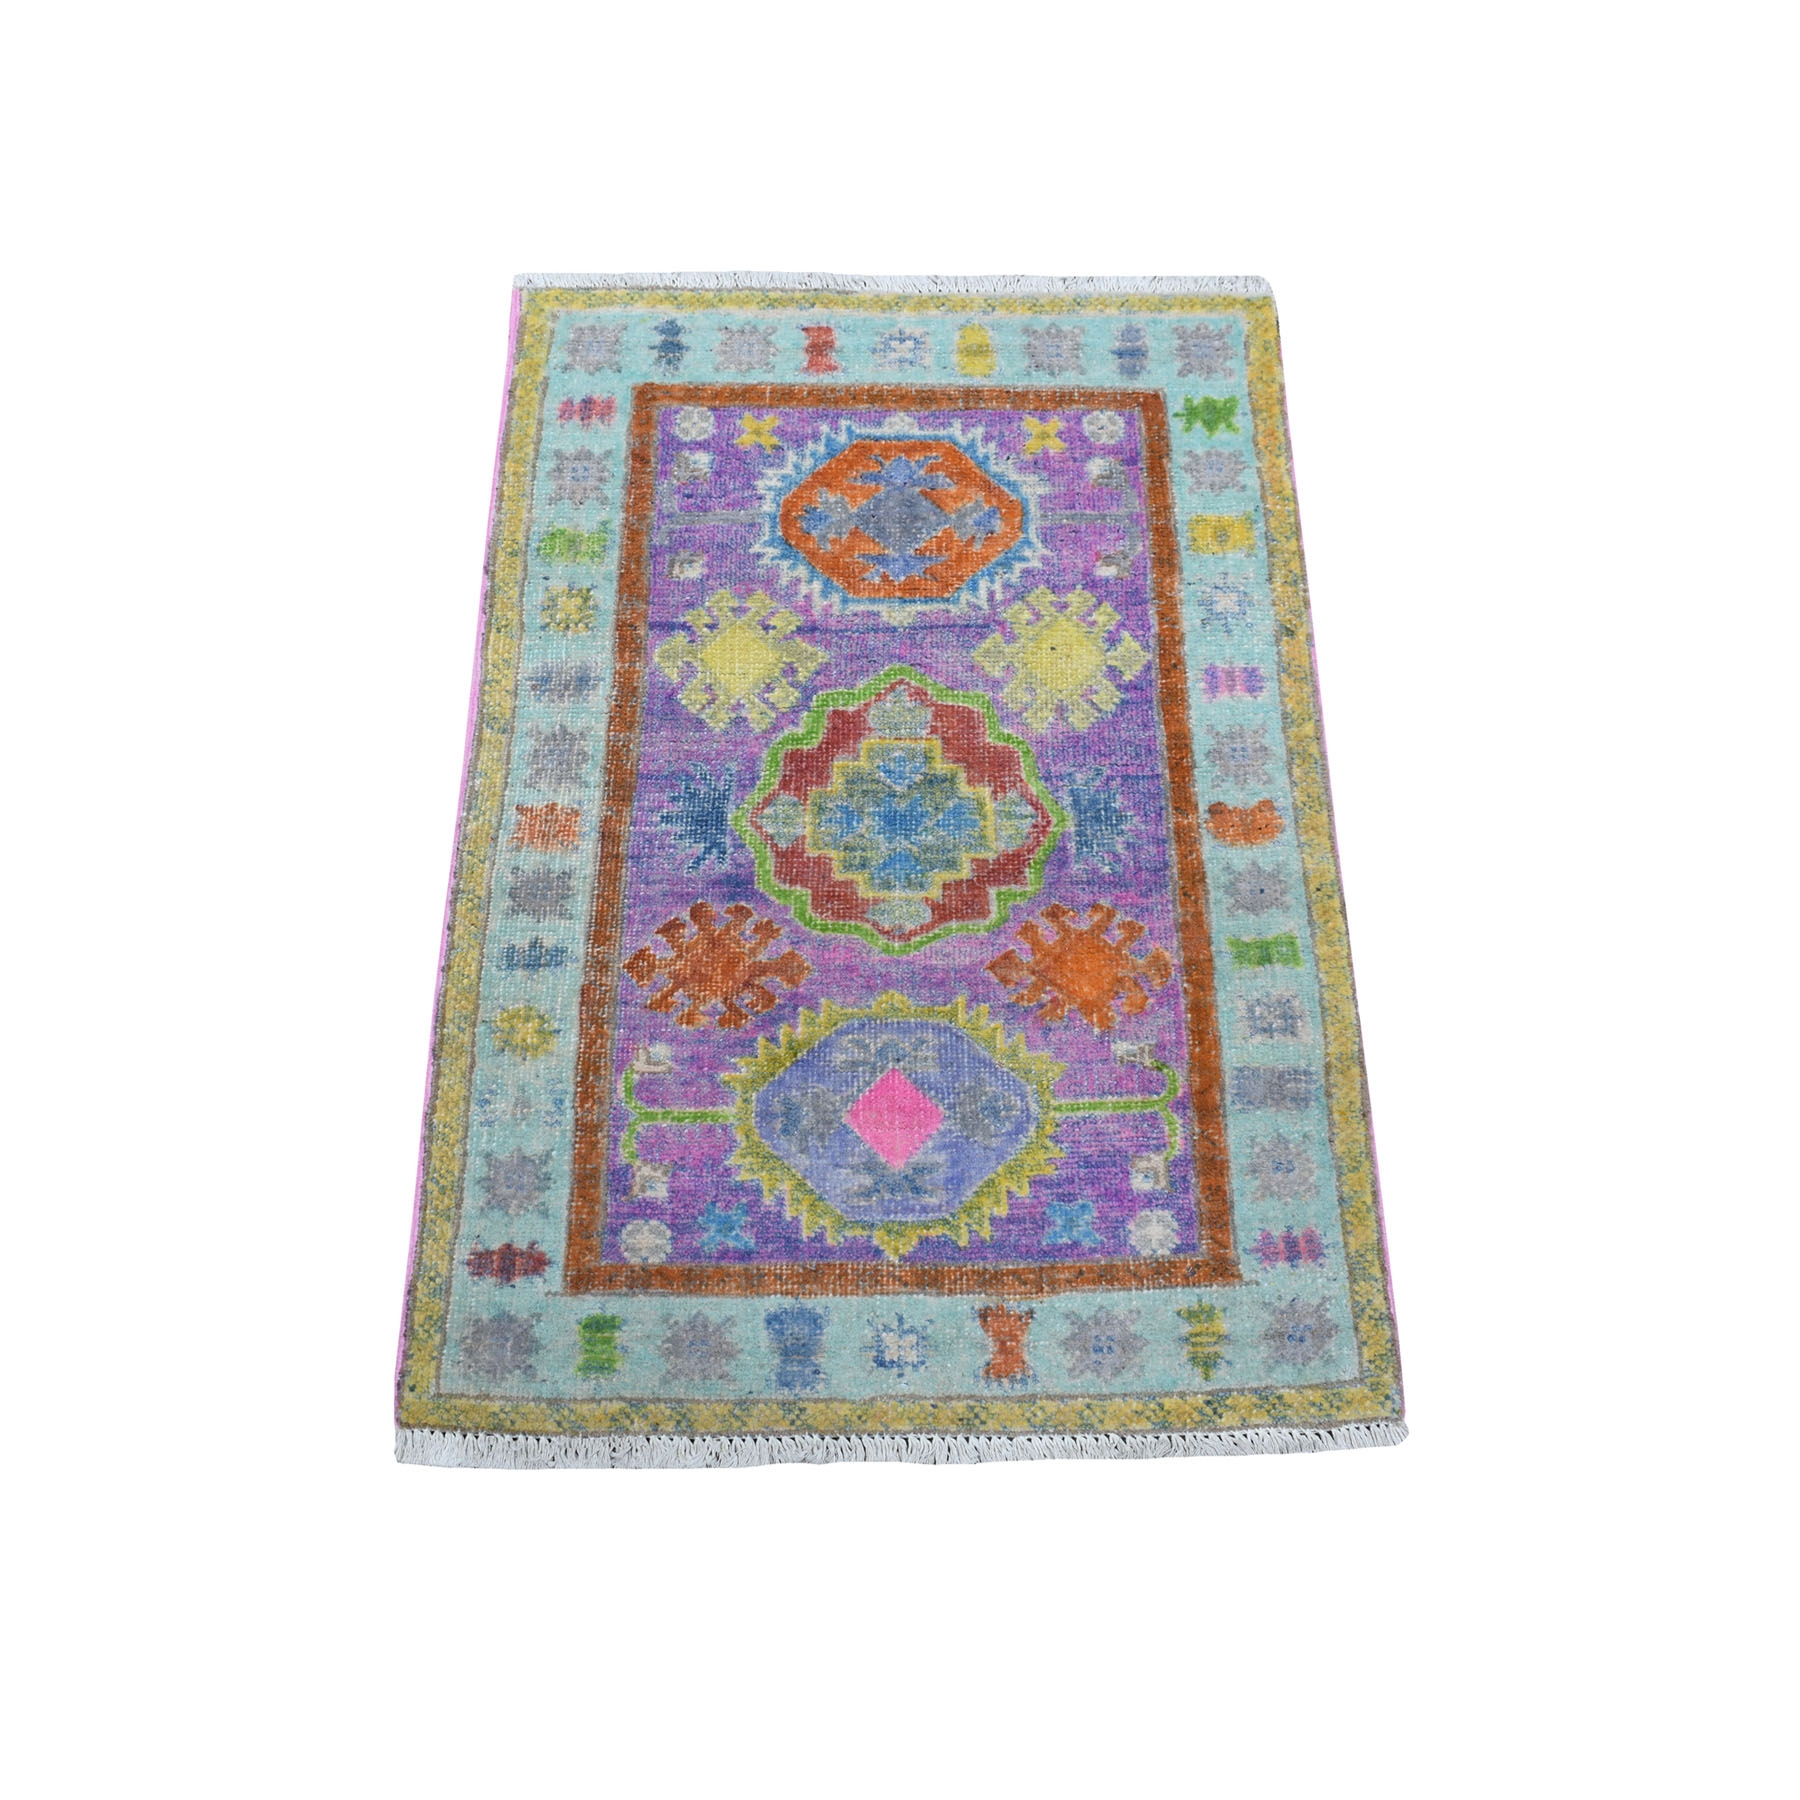 2'x3' Purple Fusion Kazak Natural Wool Hand Knotted Mat Oriental Rug